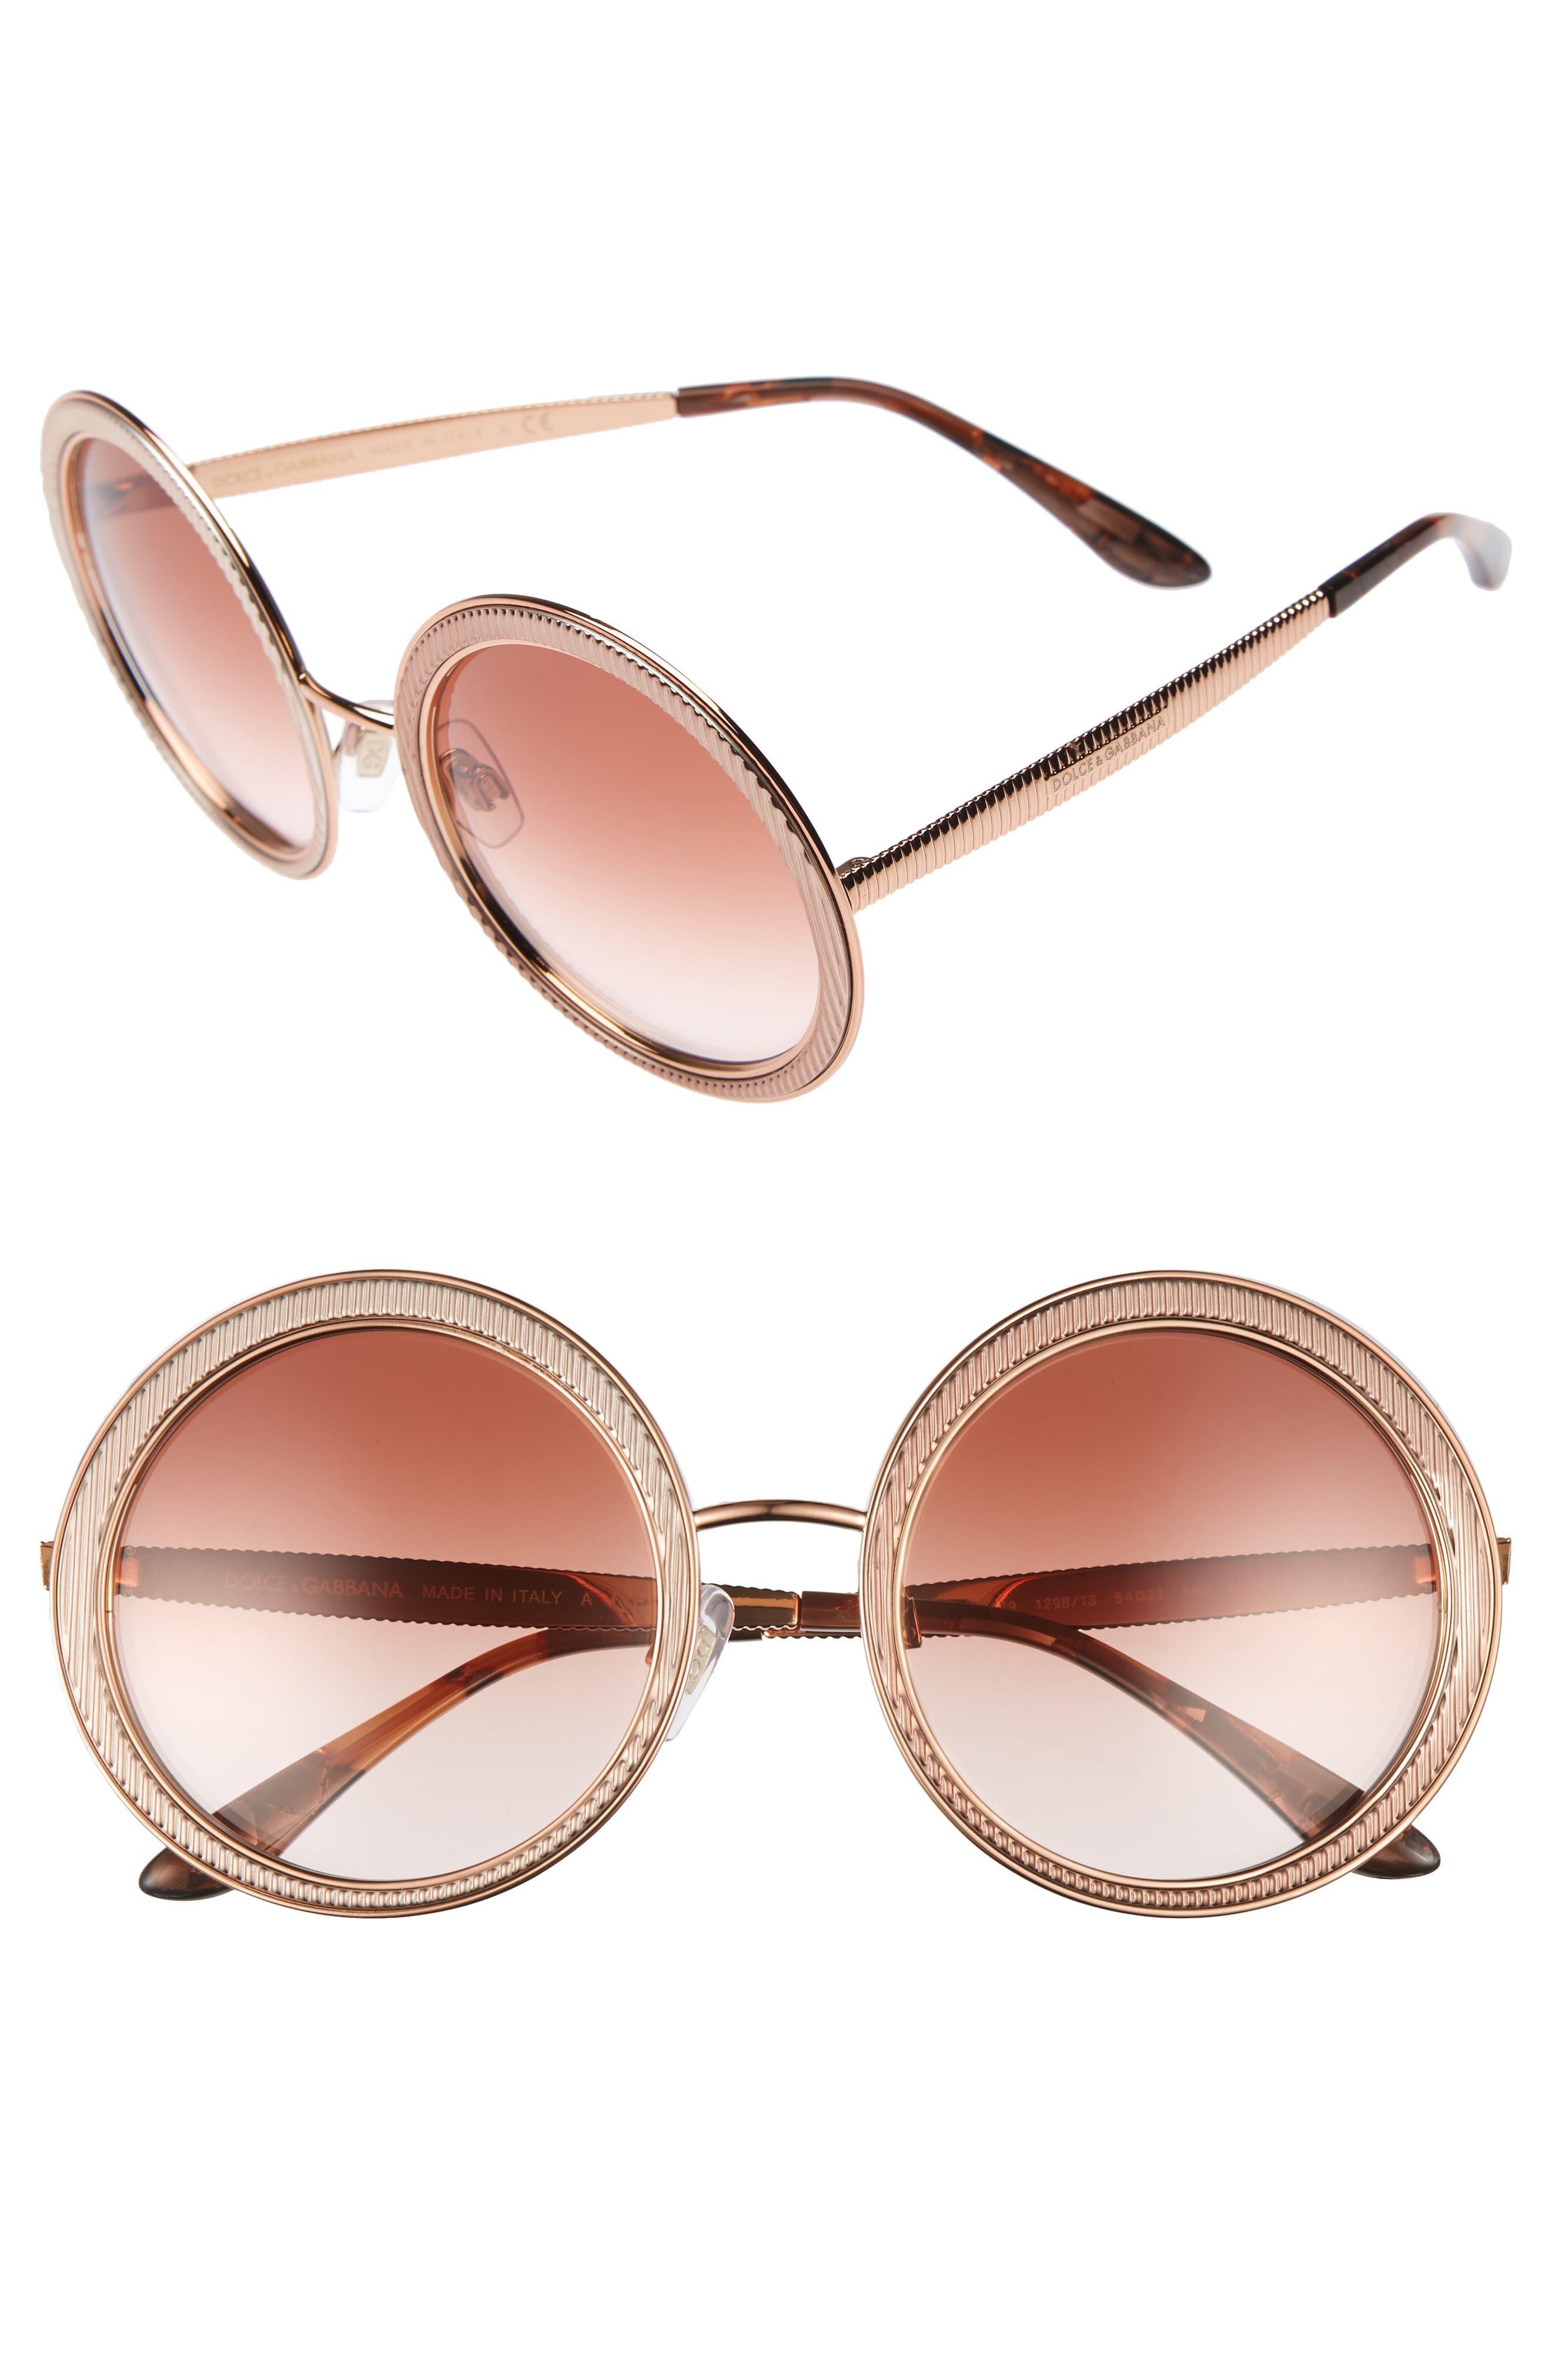 54mm Gradient Round Sunglasses,                             Main thumbnail 2, color,